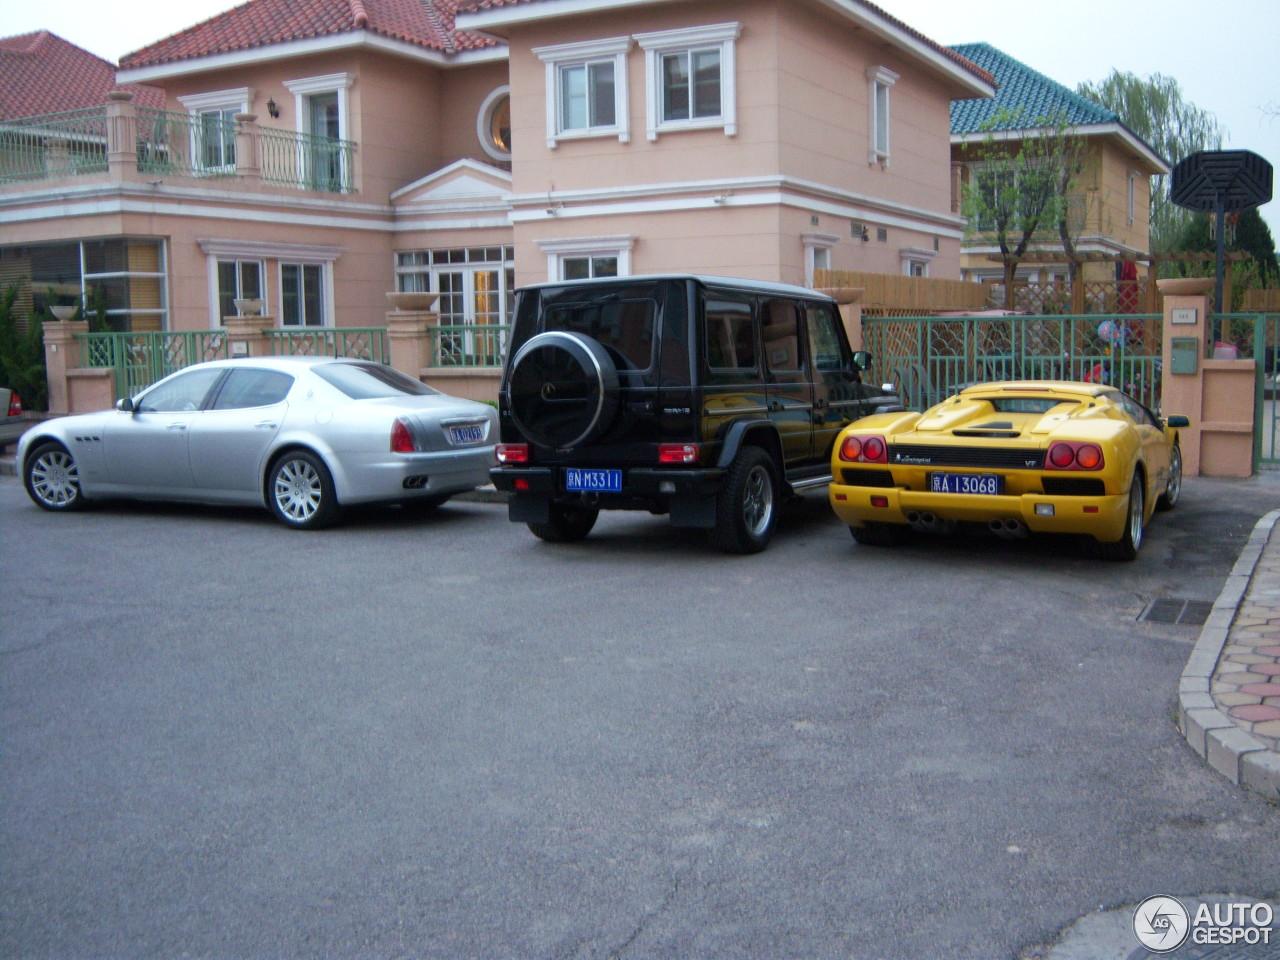 Lamborghini Diablo Vt Roadster 22 December 2012 Autogespot